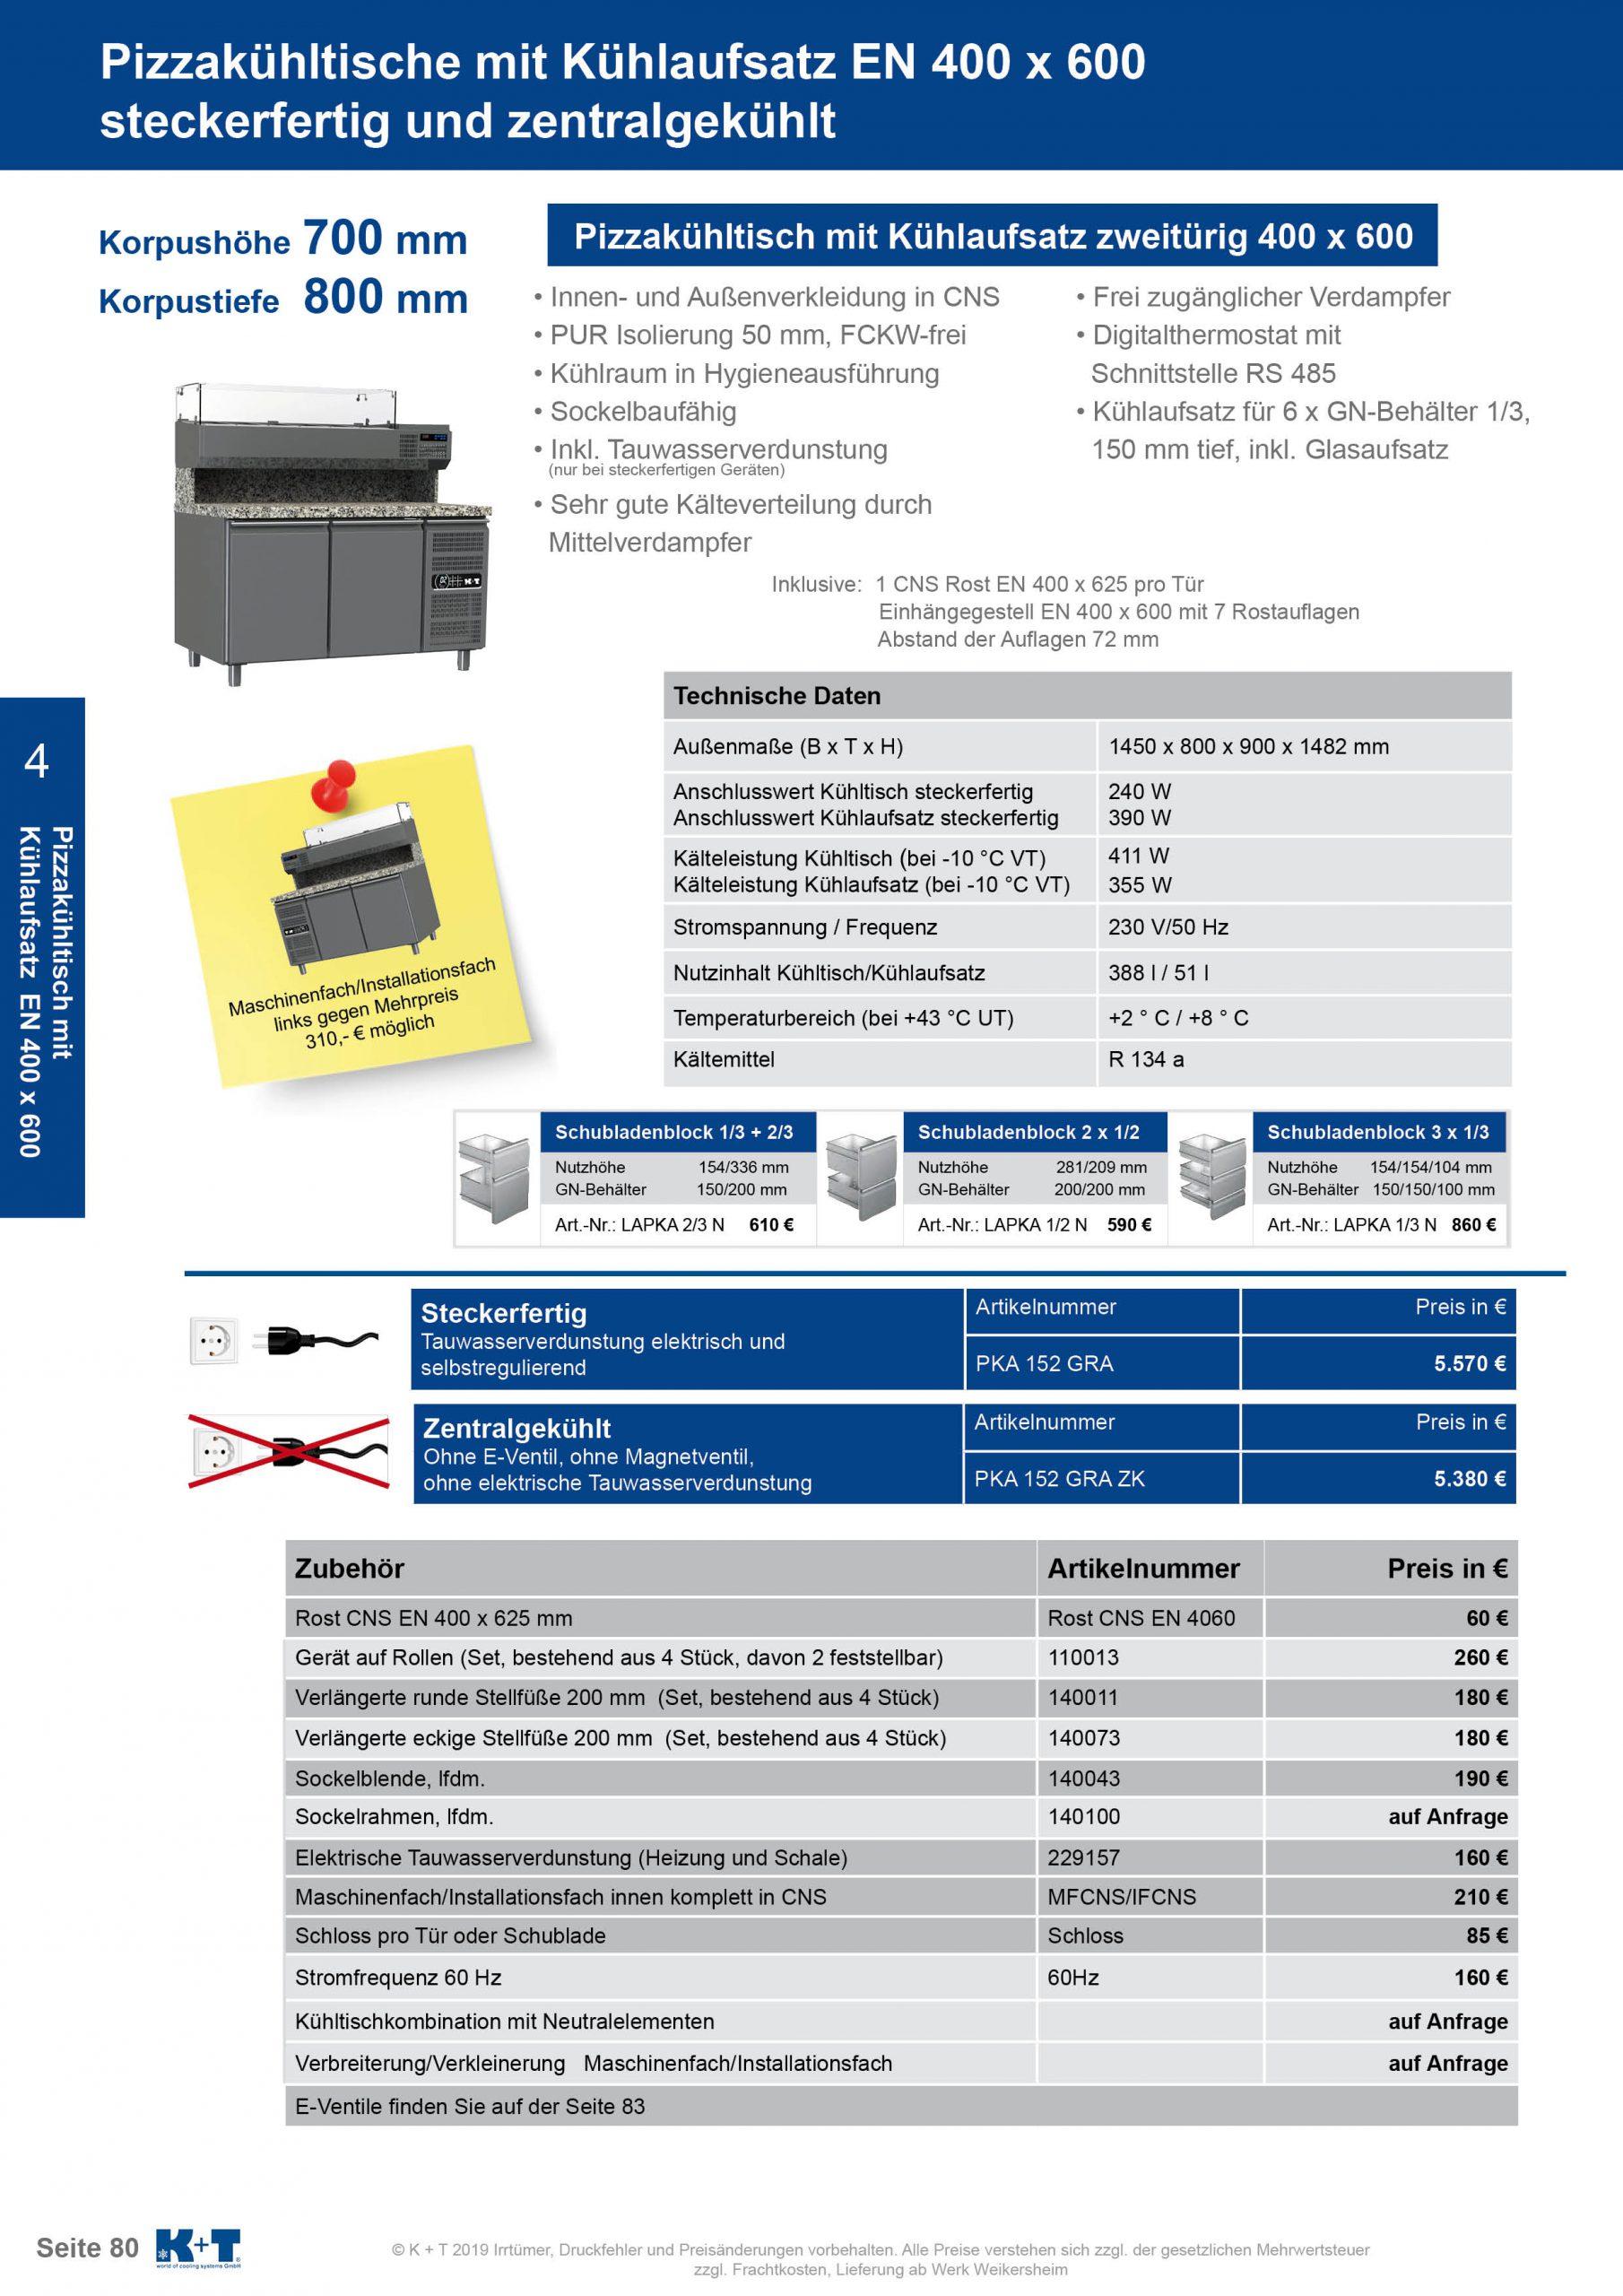 Pizzakühltisch Euronorm 400 x 600 Korpushöhe 700, Tiefe 800 zentralgekühlt 1